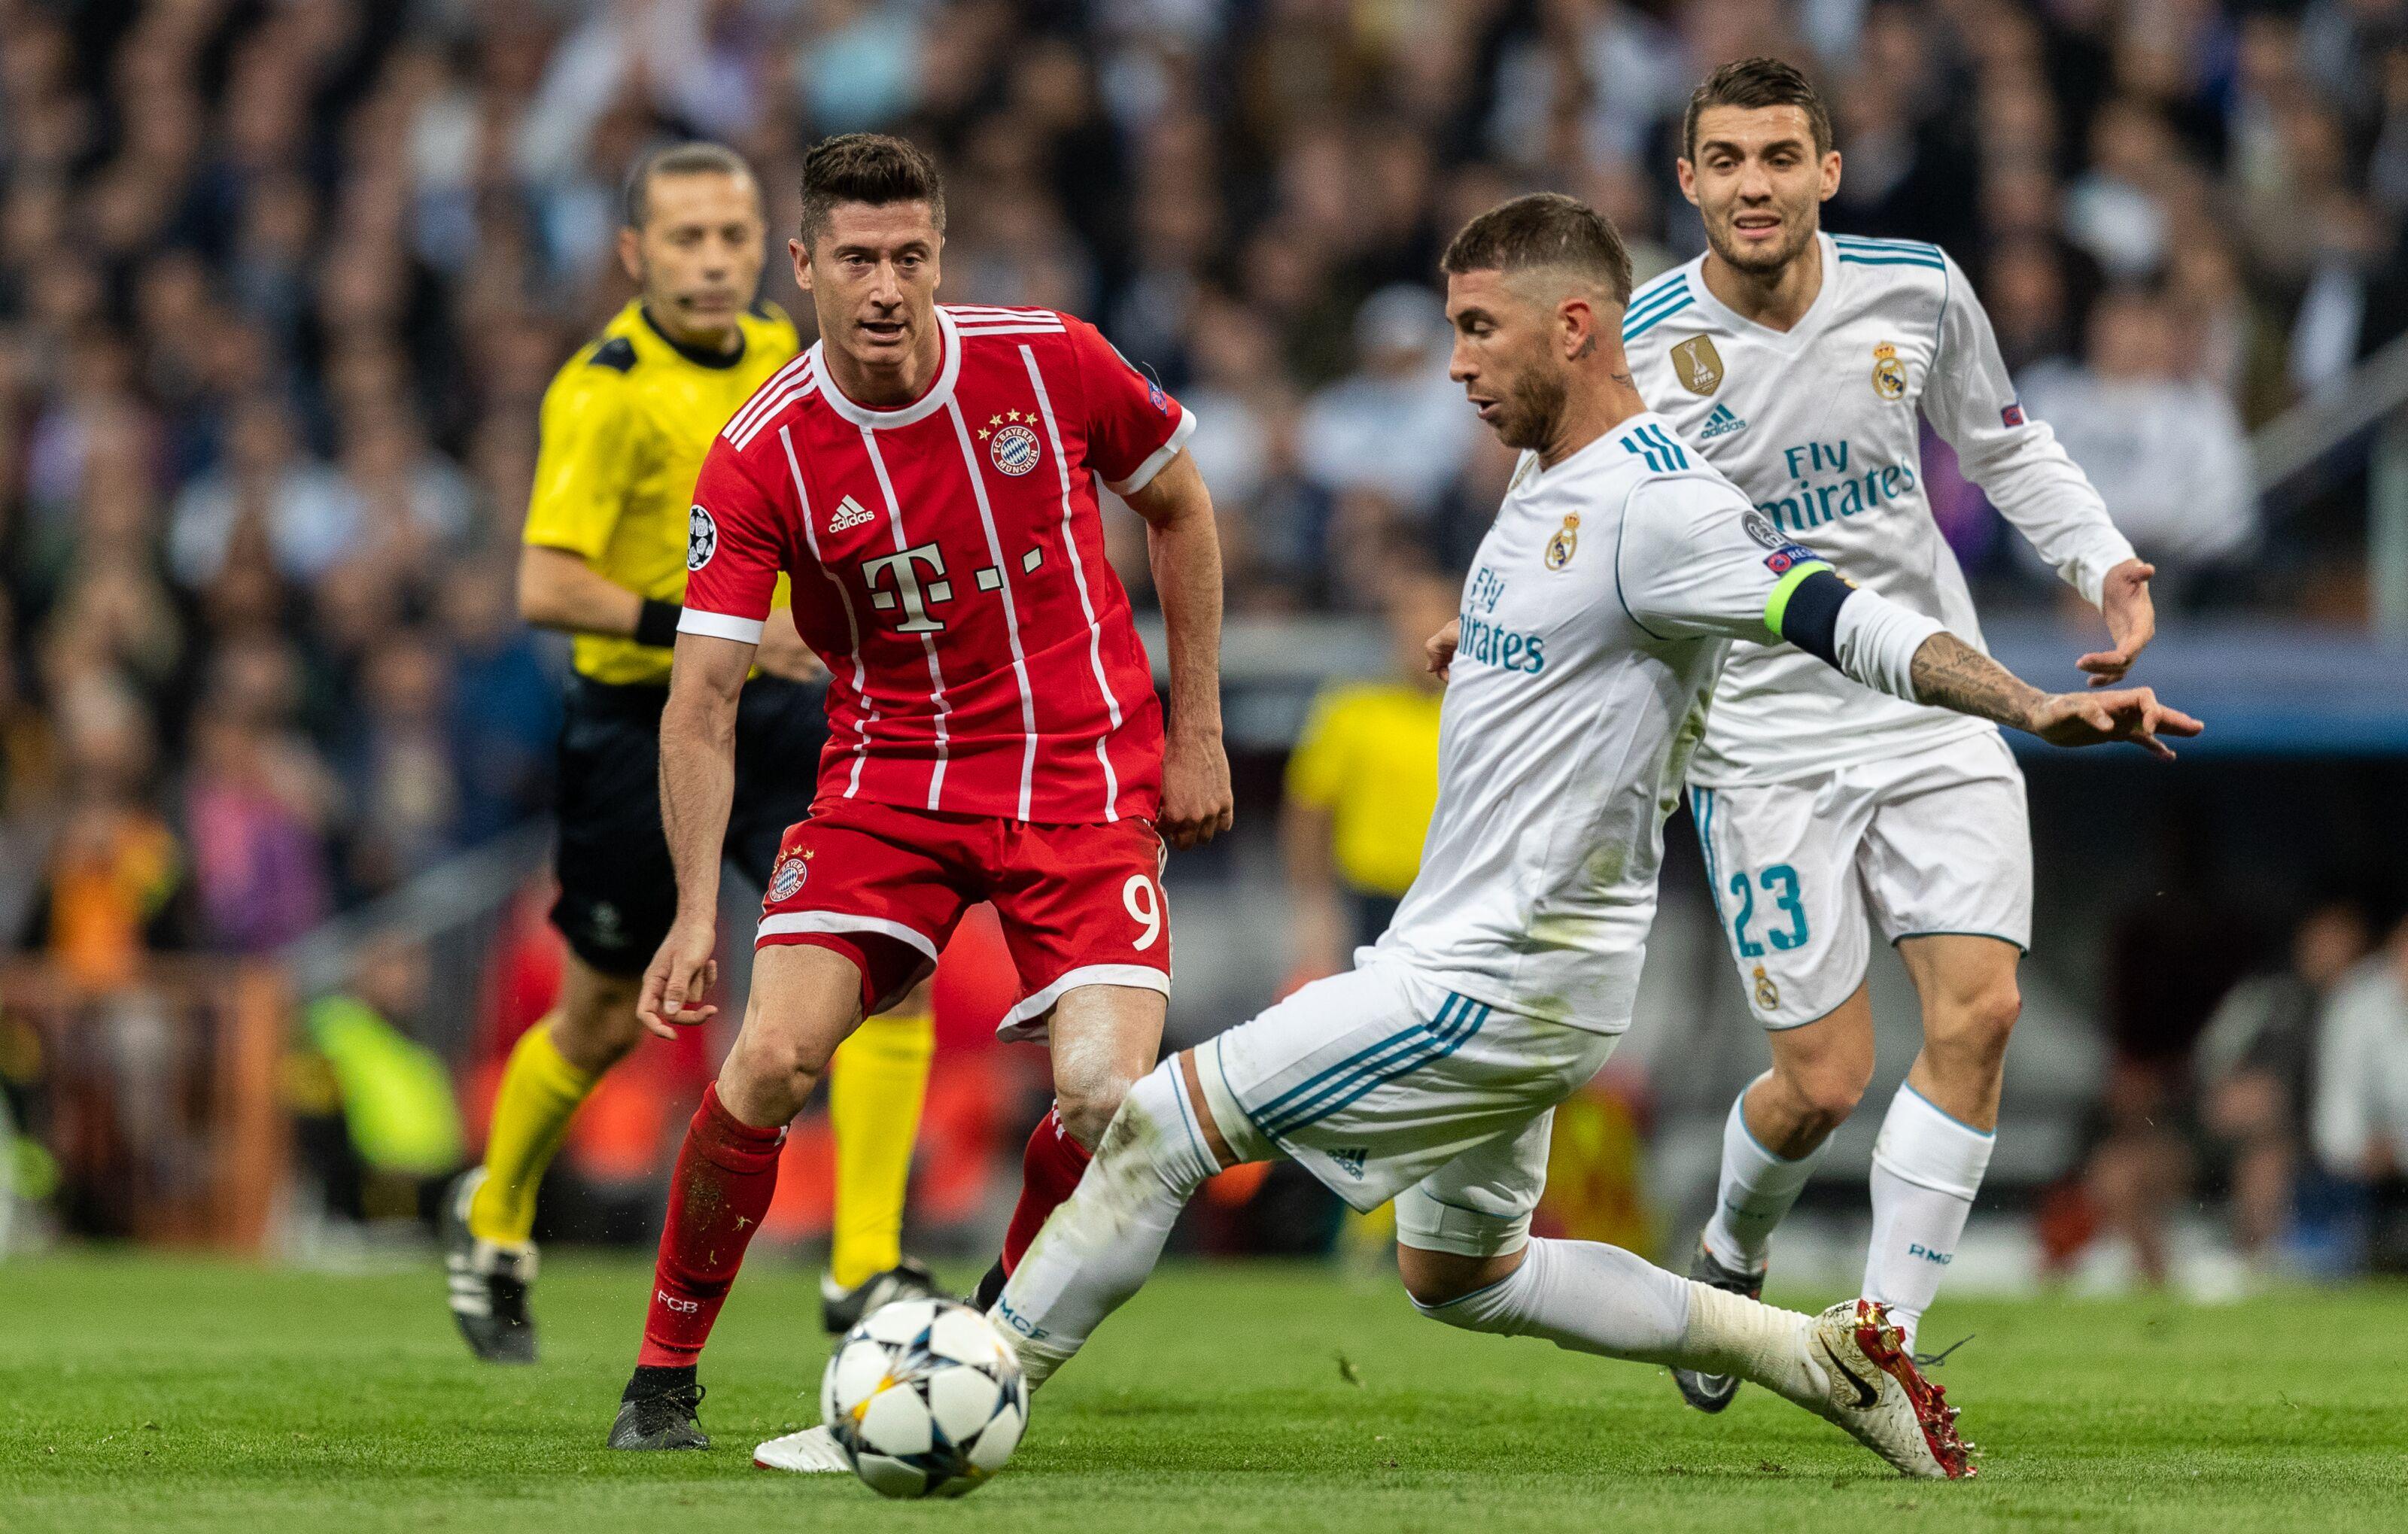 Real Madrid's players tried to lure Robert Lewandowski from Bayern Munich